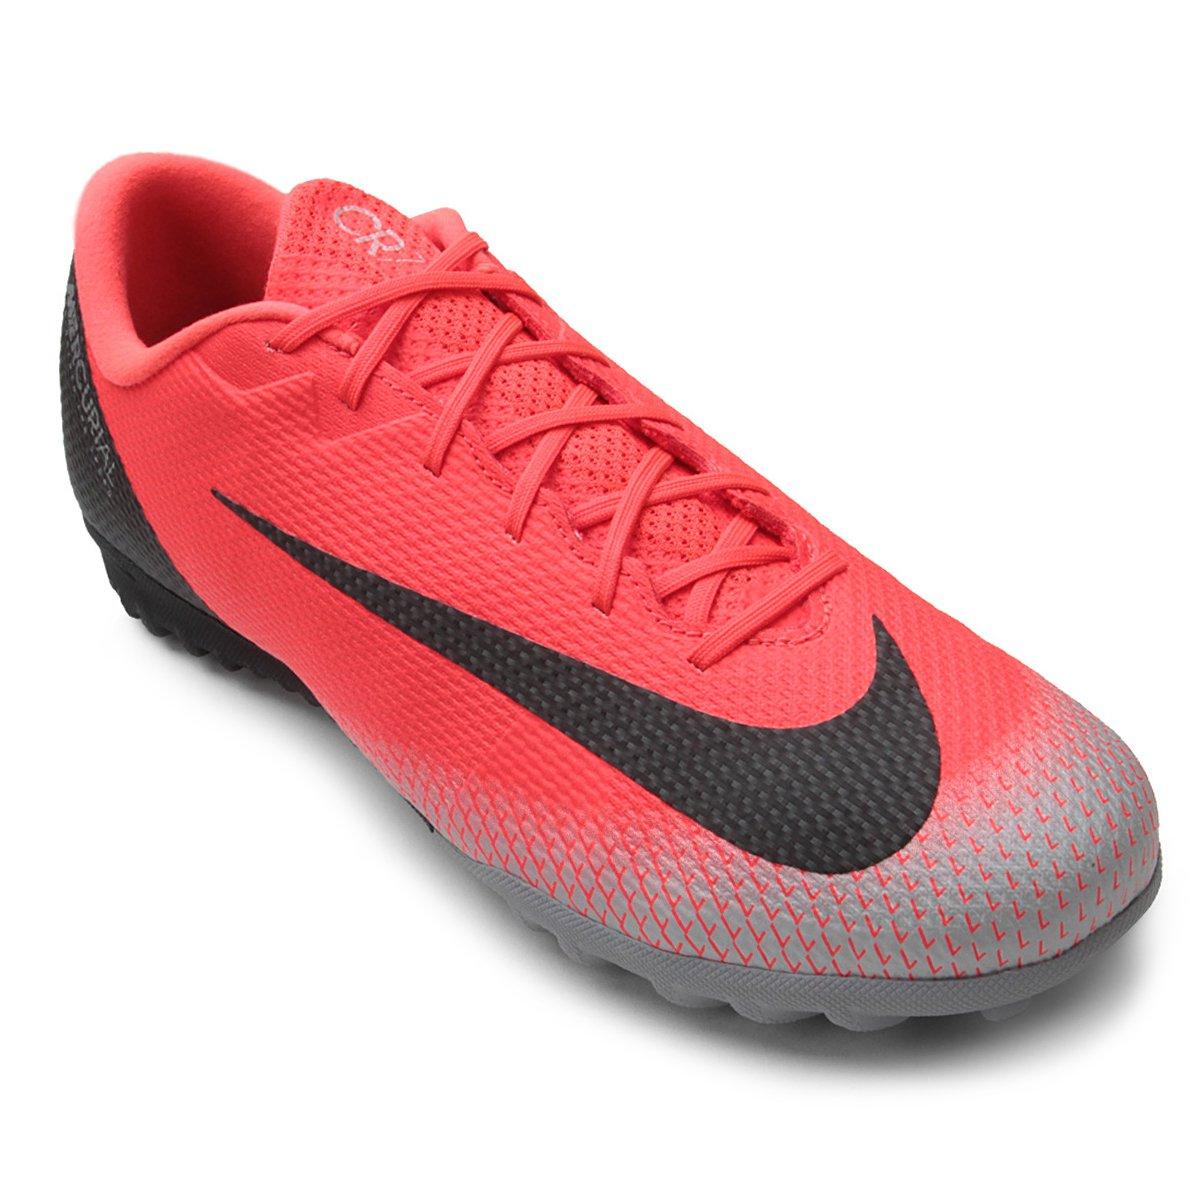 22fc9d86dd Chuteira Society Nike Mercurial Vapor 12 Academy CR7 TF | Allianz Parque  Shop